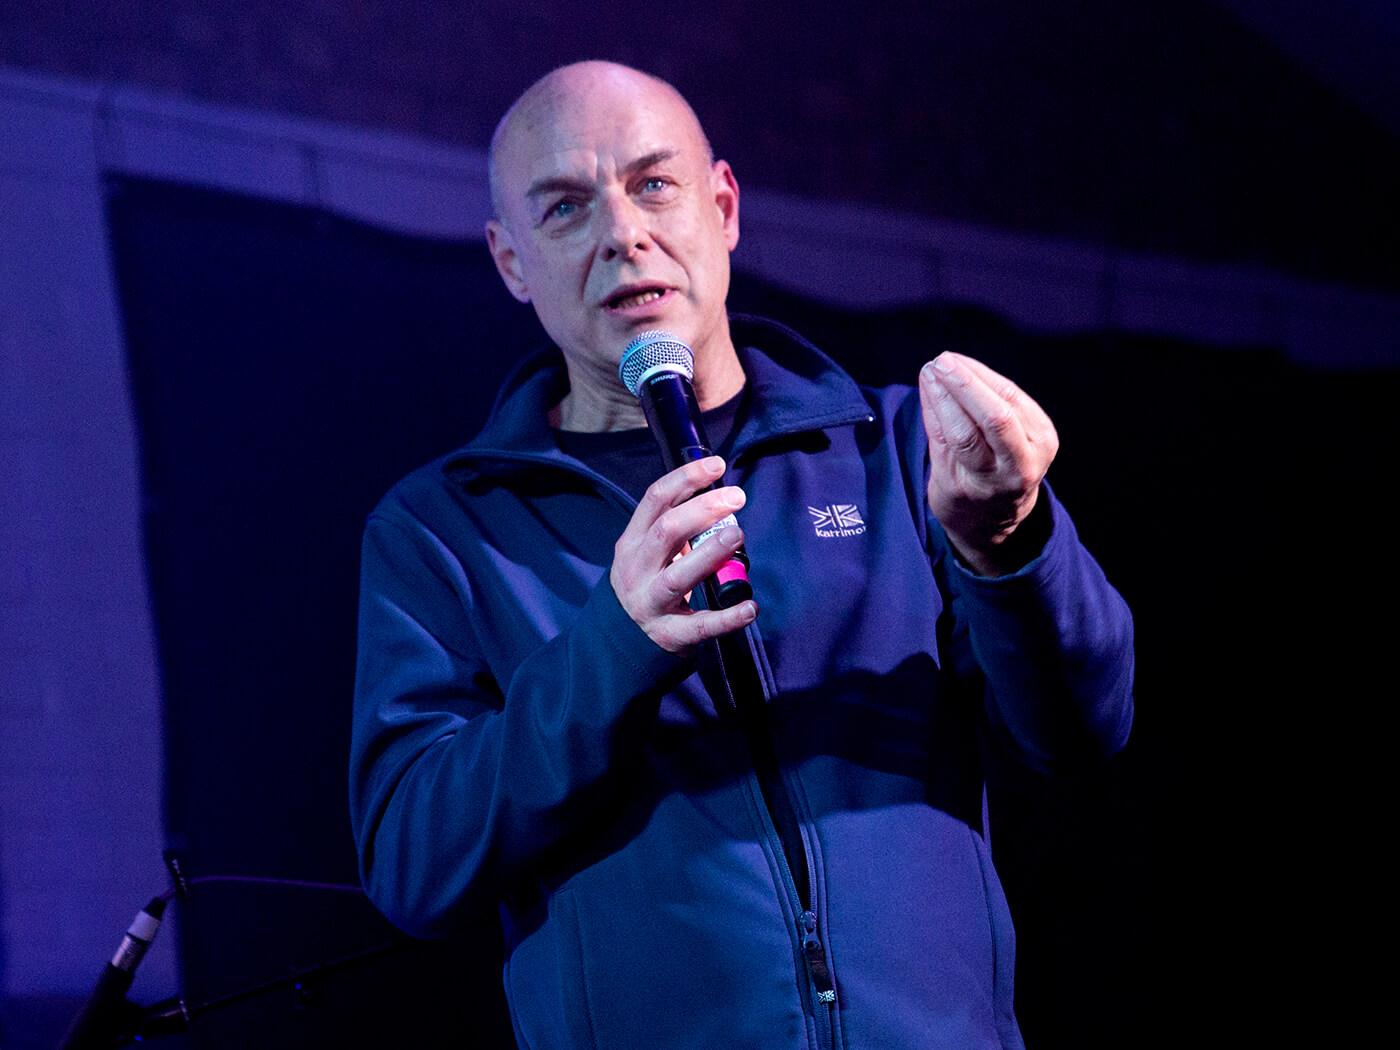 Hear Brian Eno's sarcastic election song